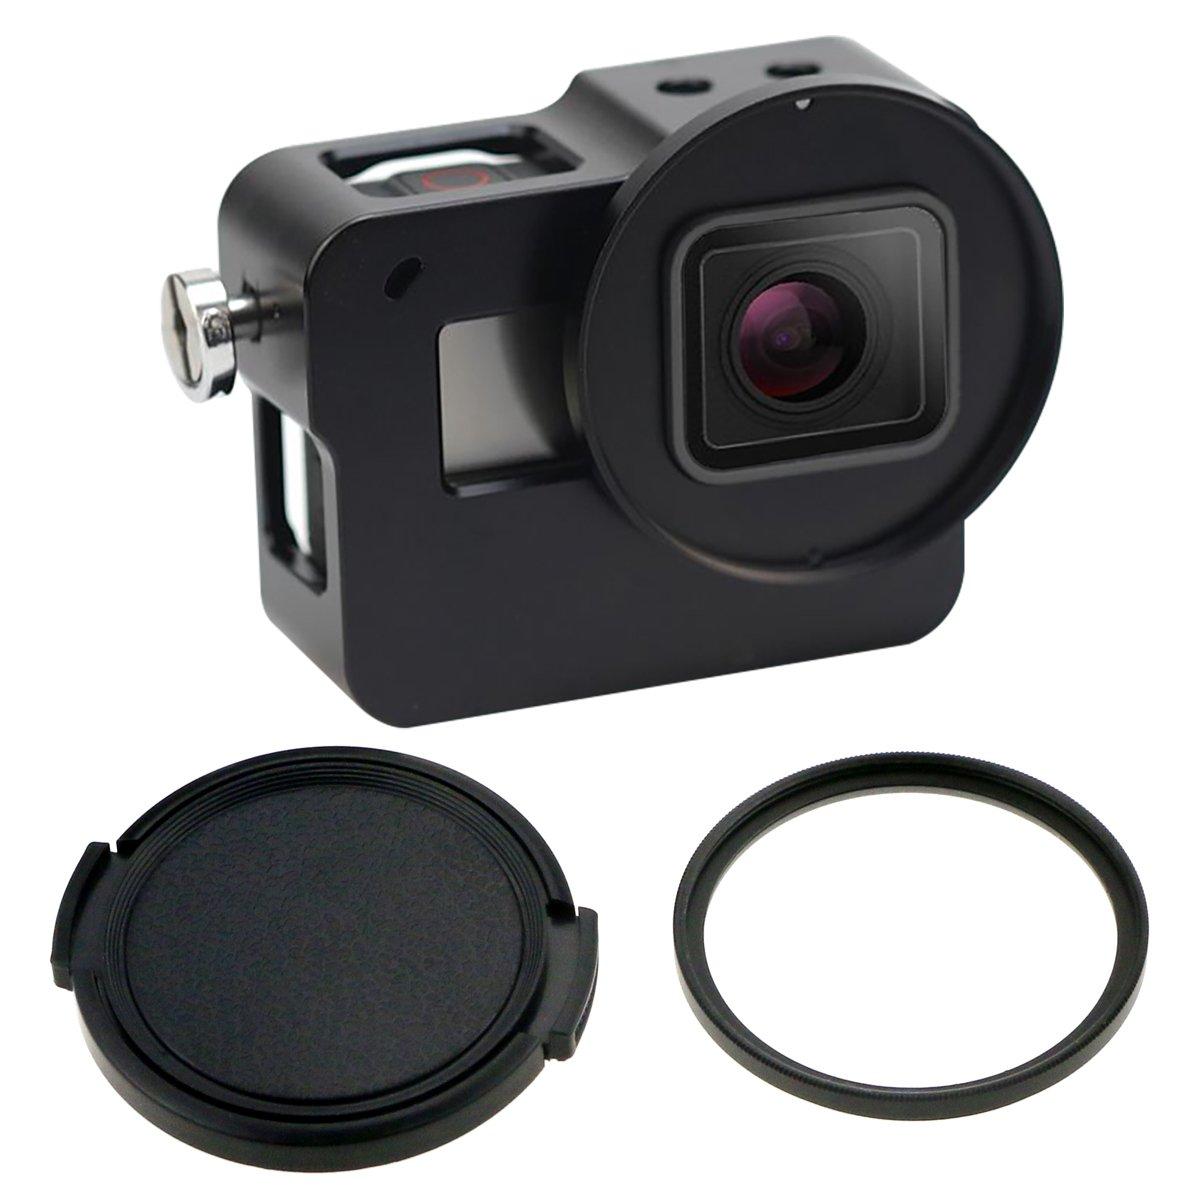 Fixget Housing Case for GoPro Hero 5/Hero 6, Aluminium Alloy Metal ShockProof Skeleton Housing Border Protective Frame Case Shell with 52mm UV Filter for Gopro Hero 5 Black Camera